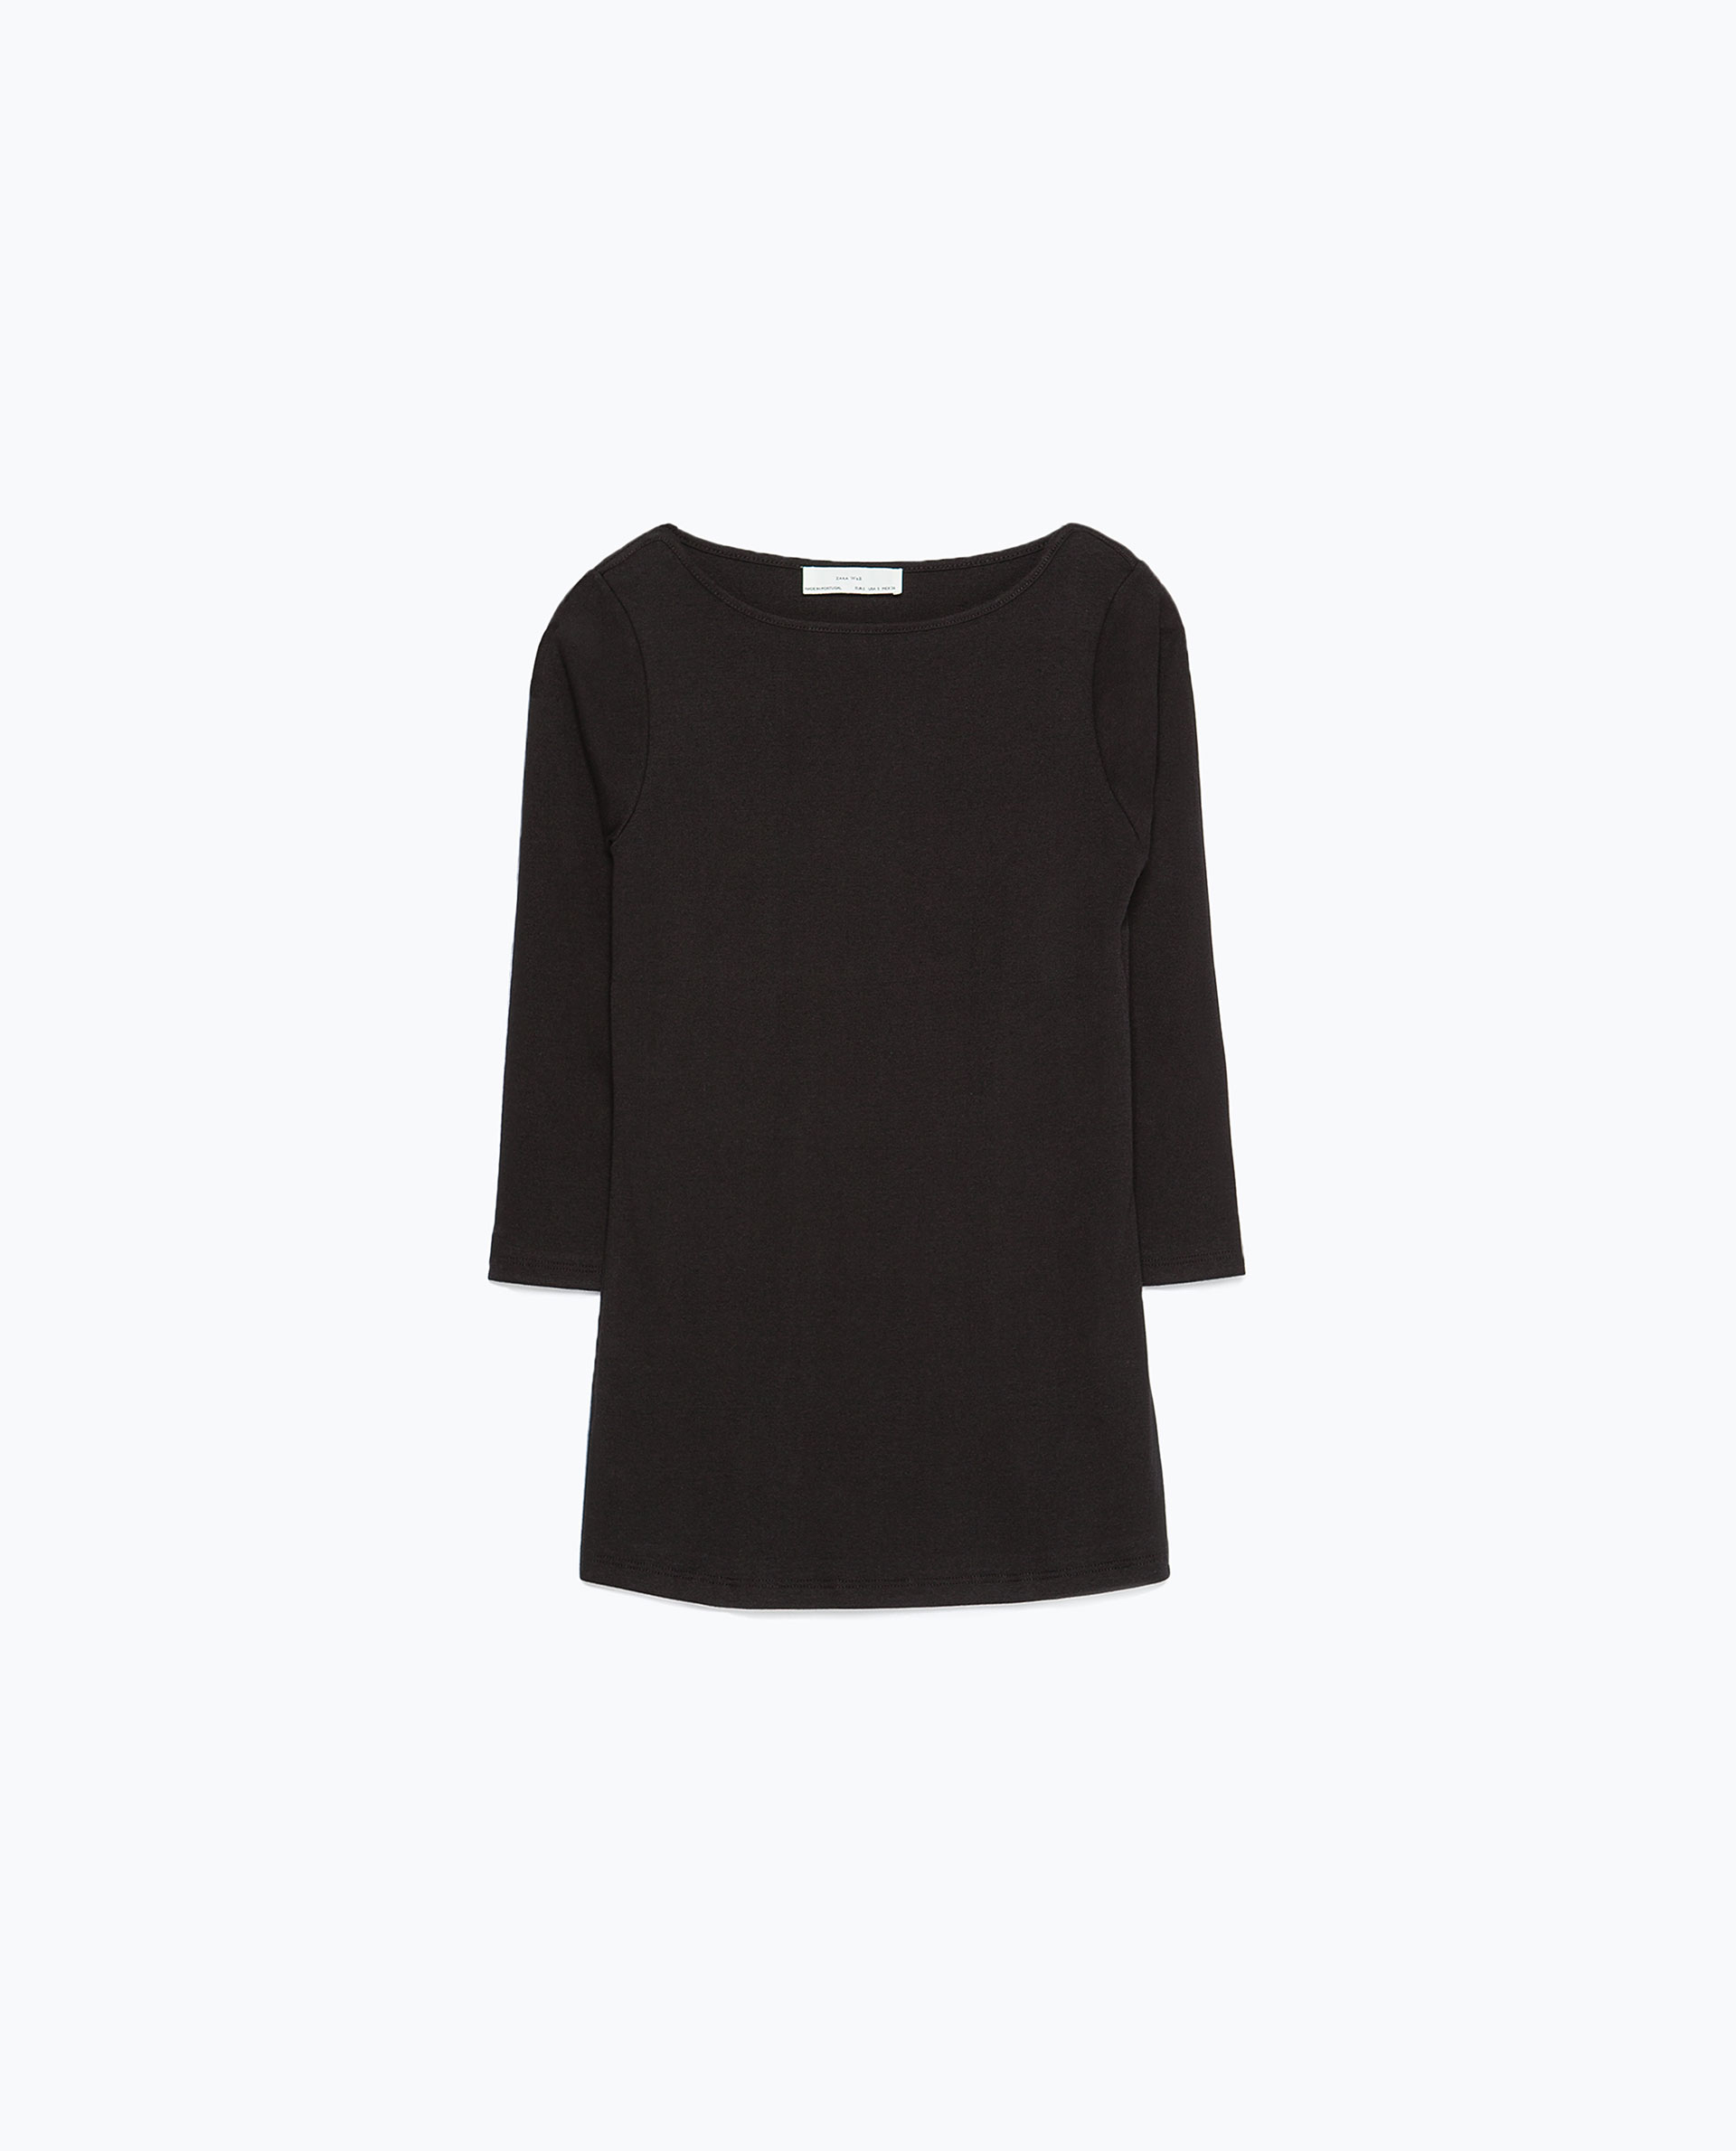 Zara organic cotton t shirt in black lyst for Zara black t shirt dress